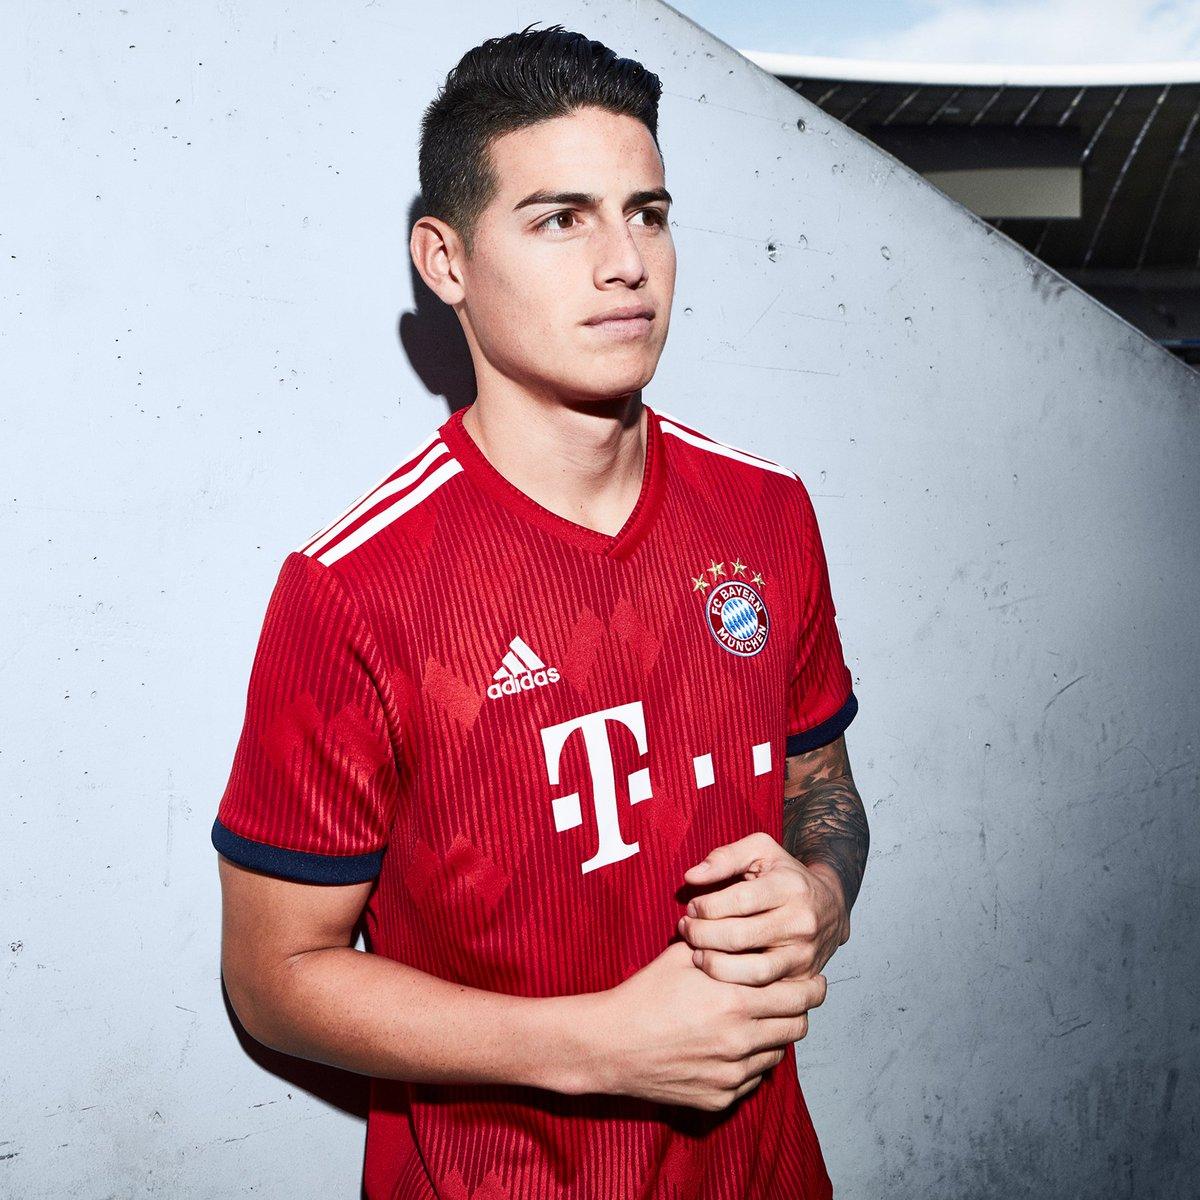 972ad690 FC Bayern US on Twitter: